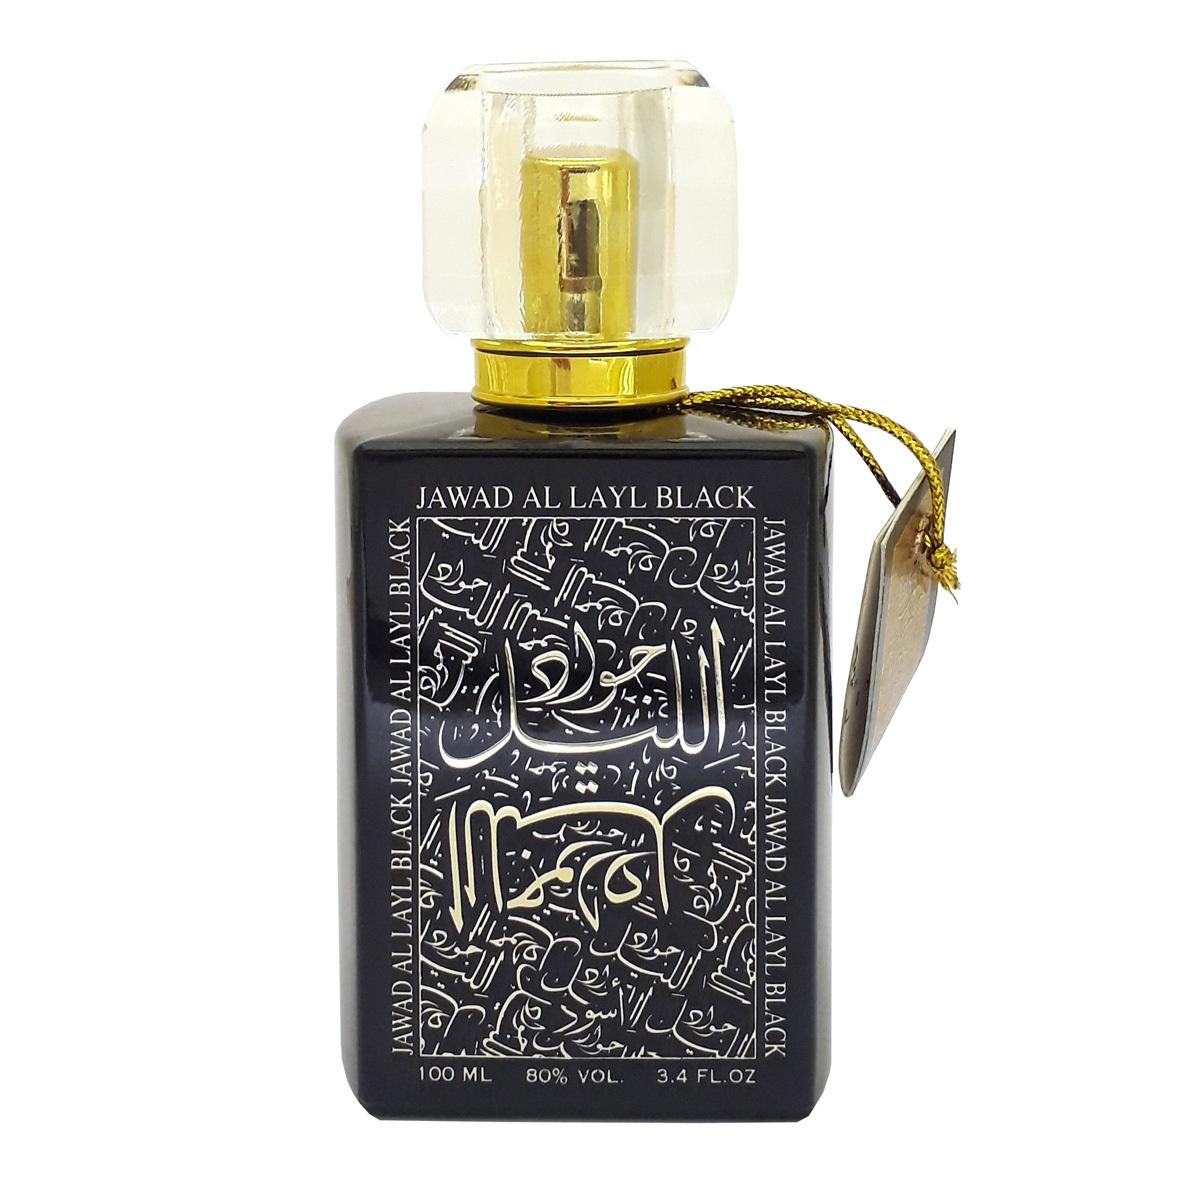 Jawad al Layl Black / Джавад аль Лайл Черный 100 мл спрей от Халис Khalis Perfumes